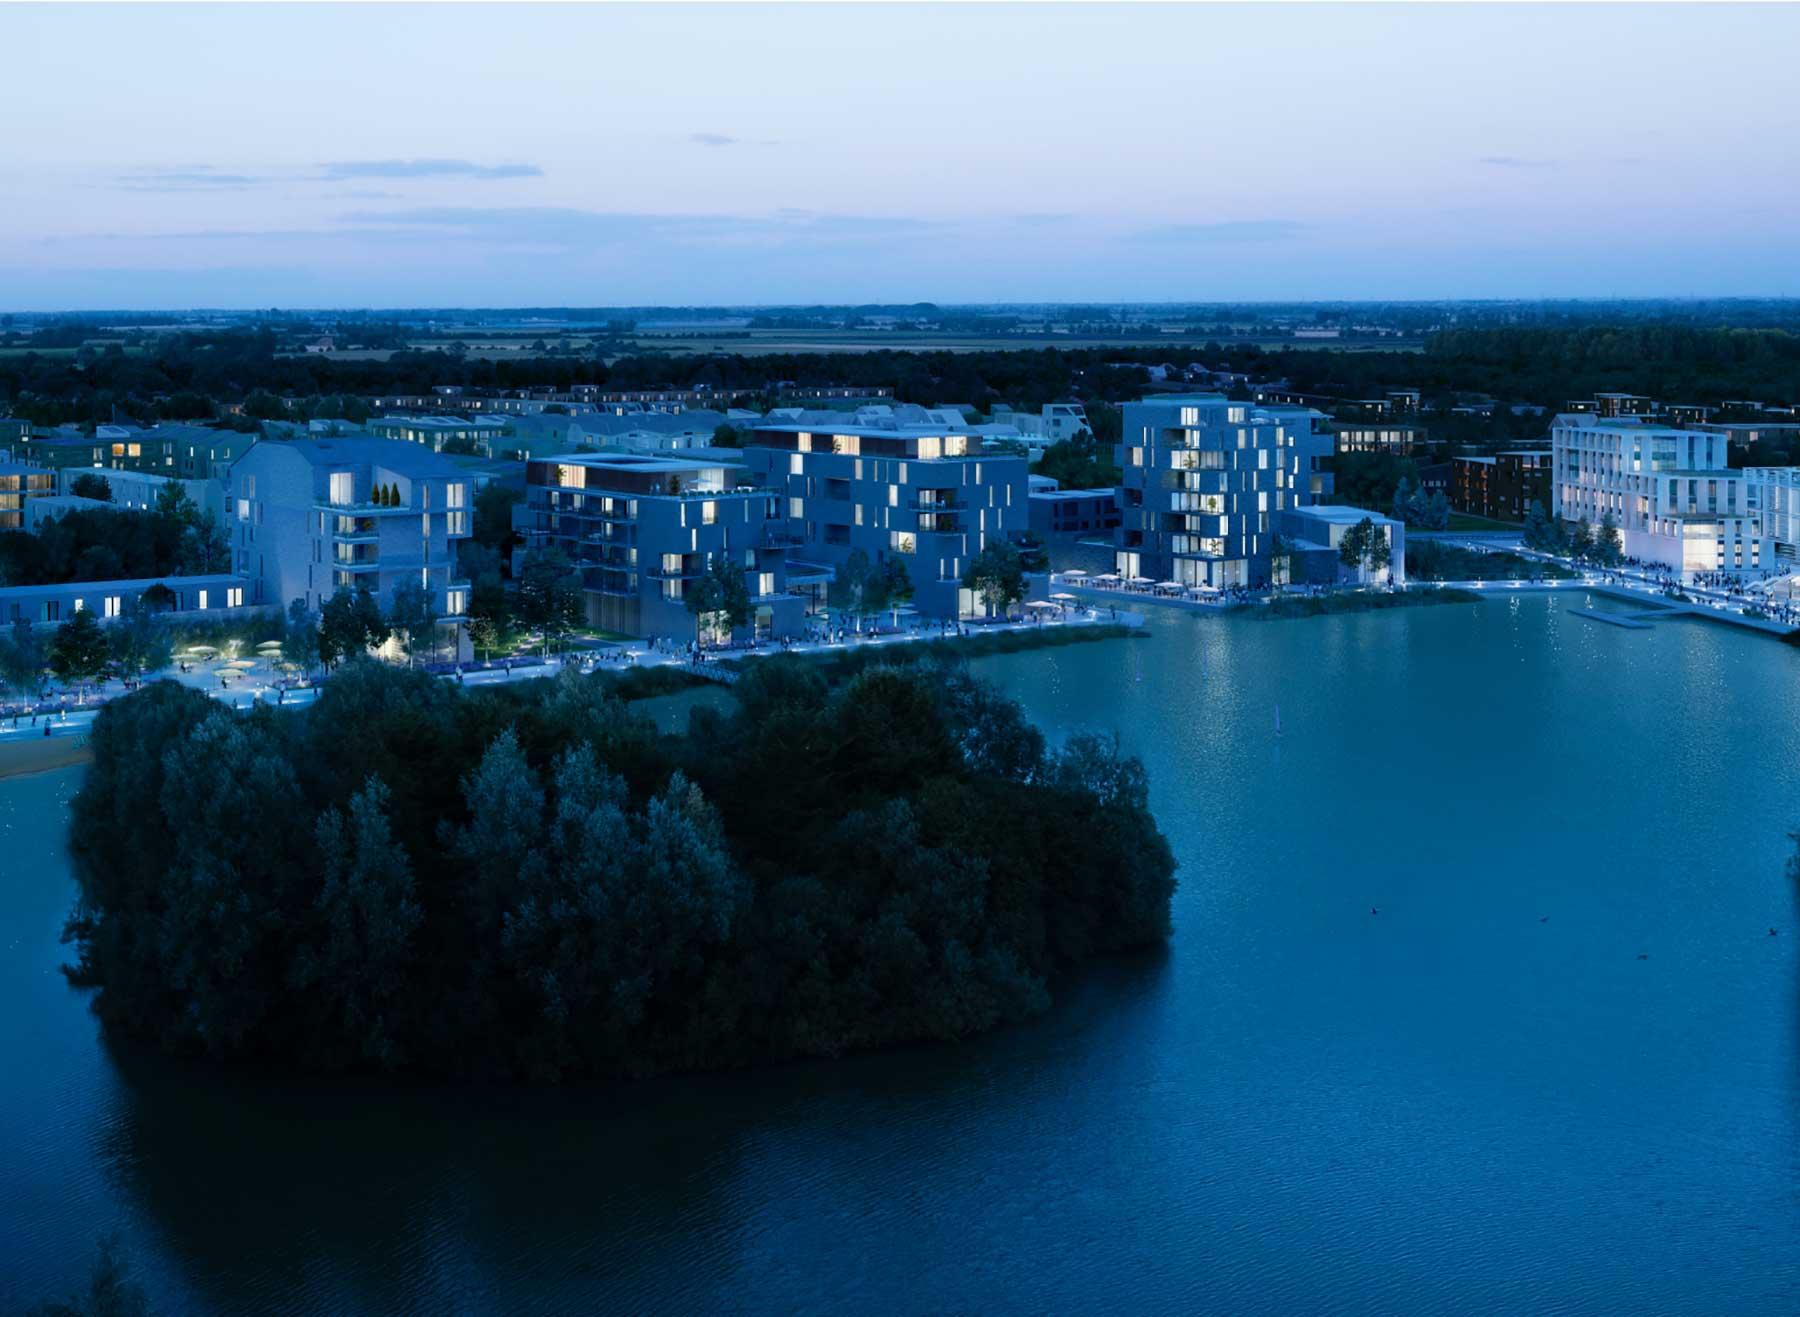 waterbeach lake at night